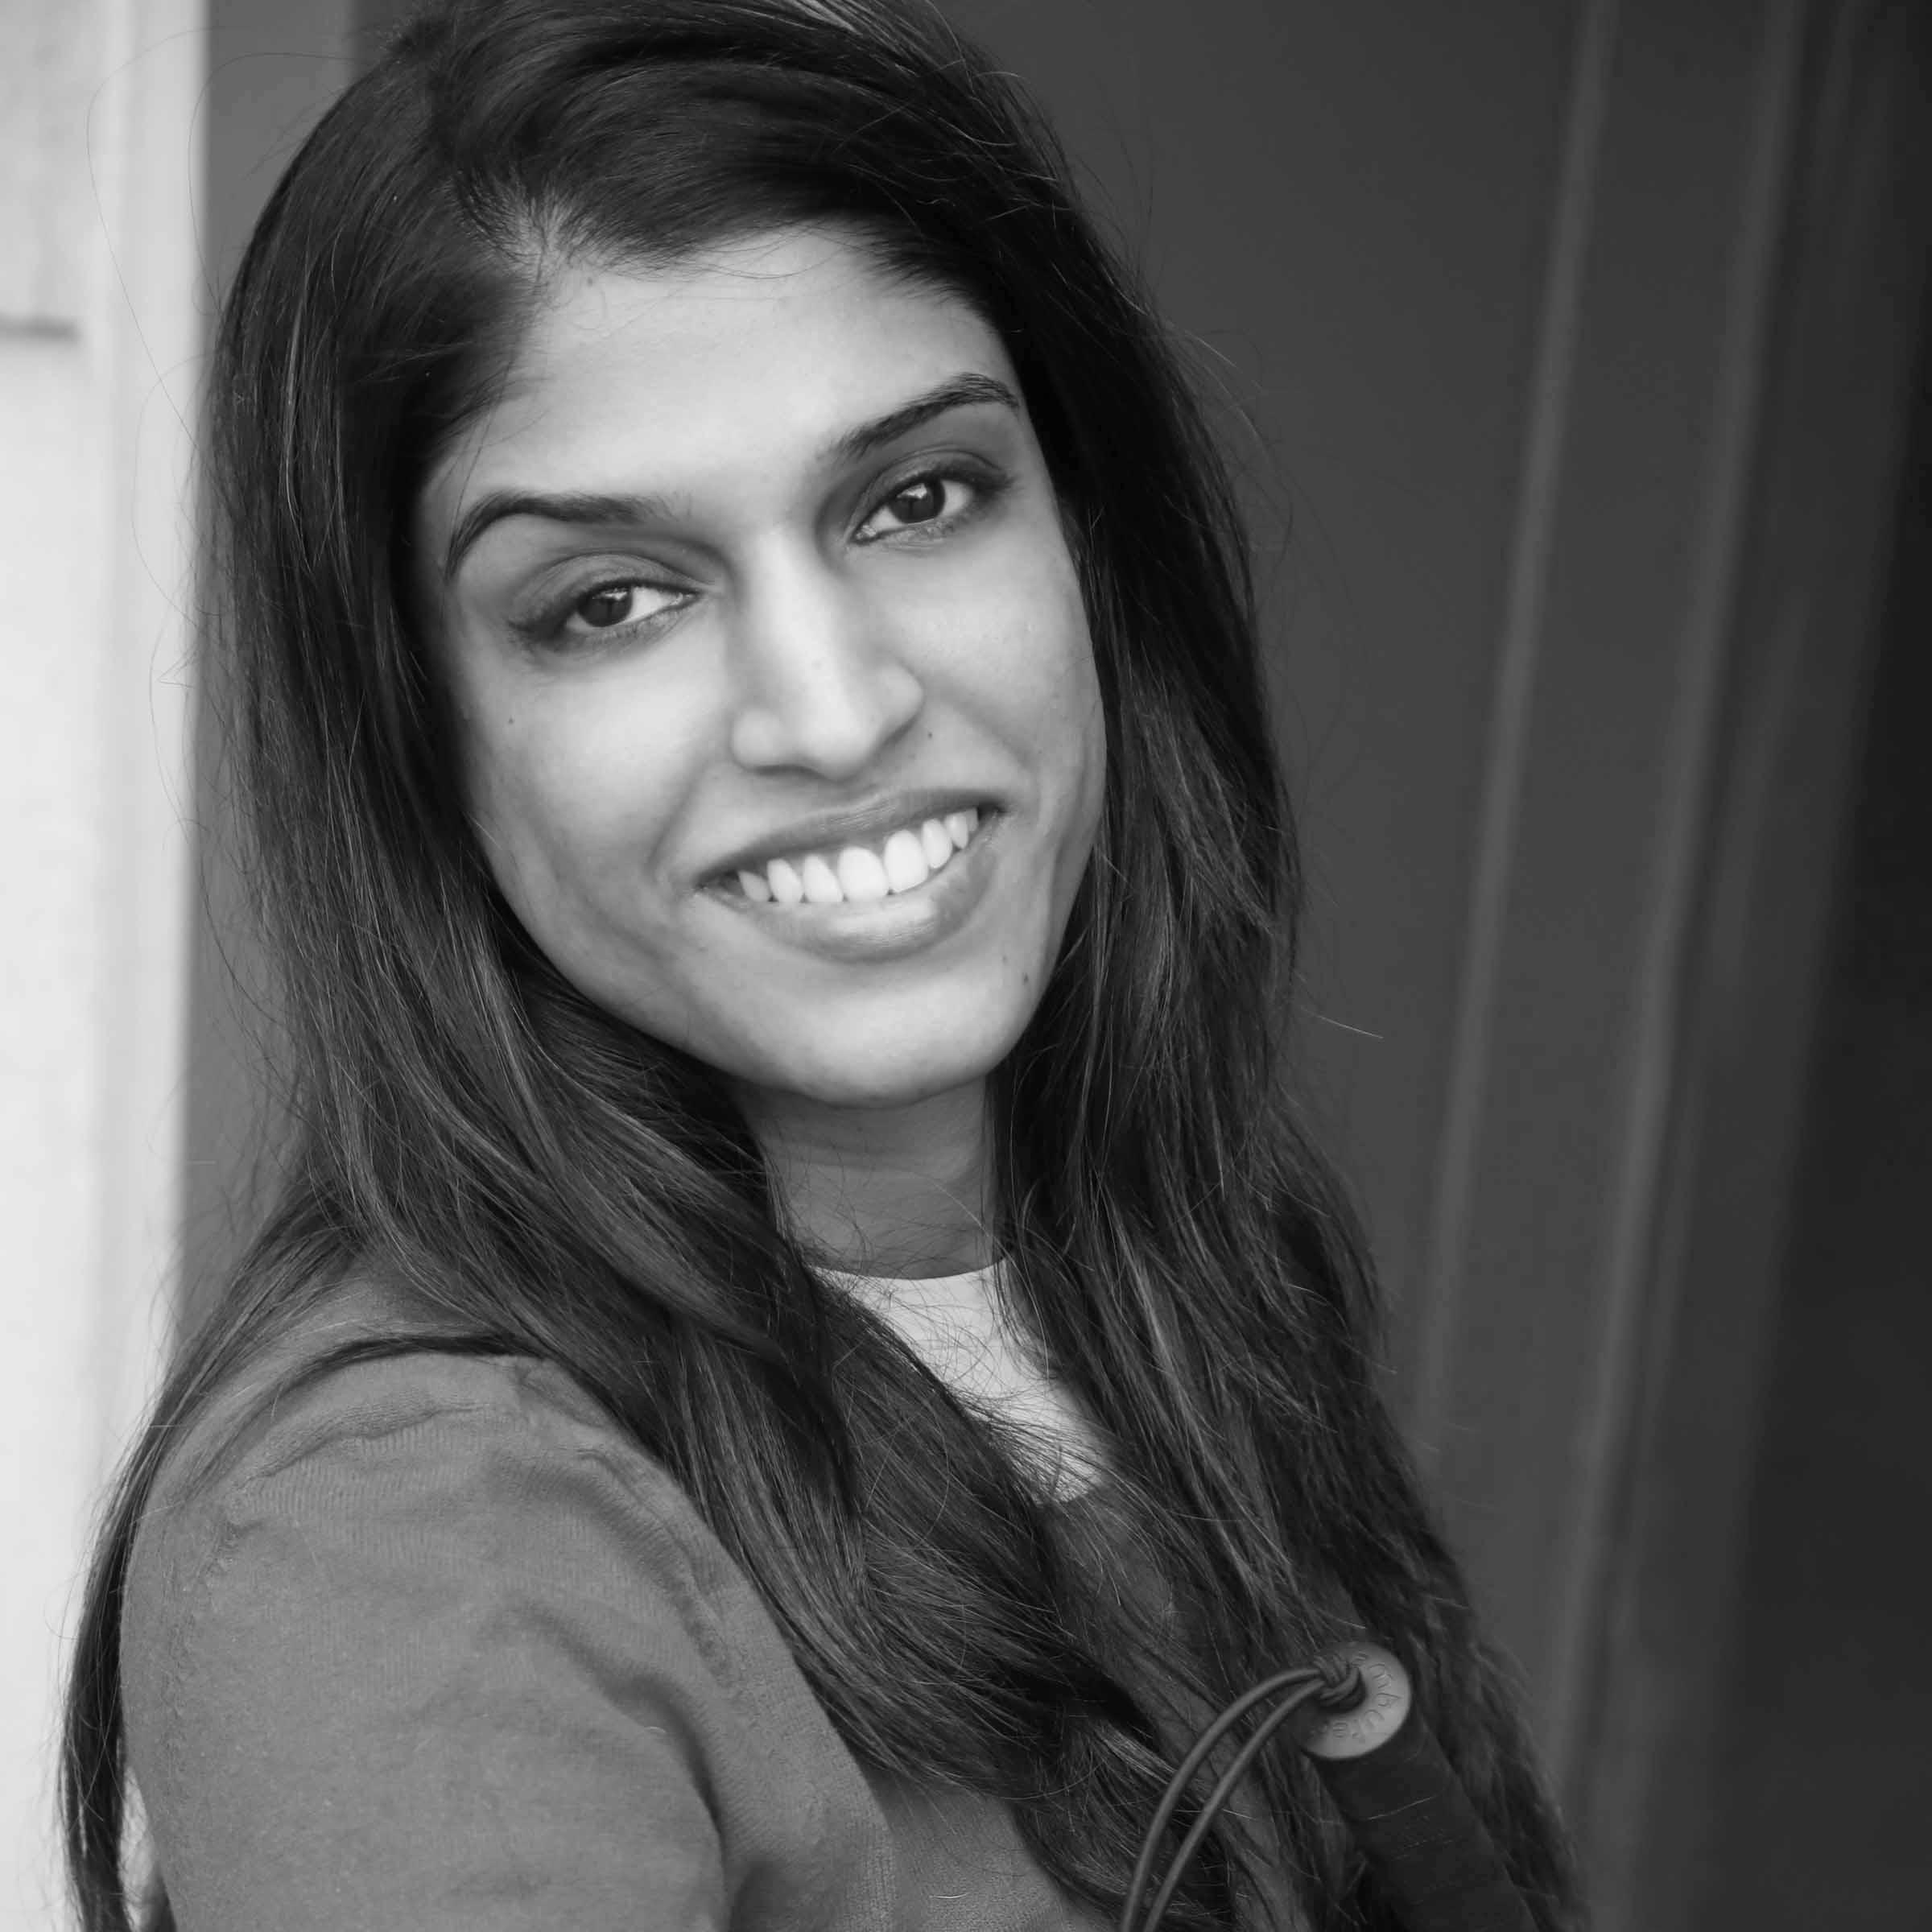 Headshot of Khadija Bari smiling leaning against a wall